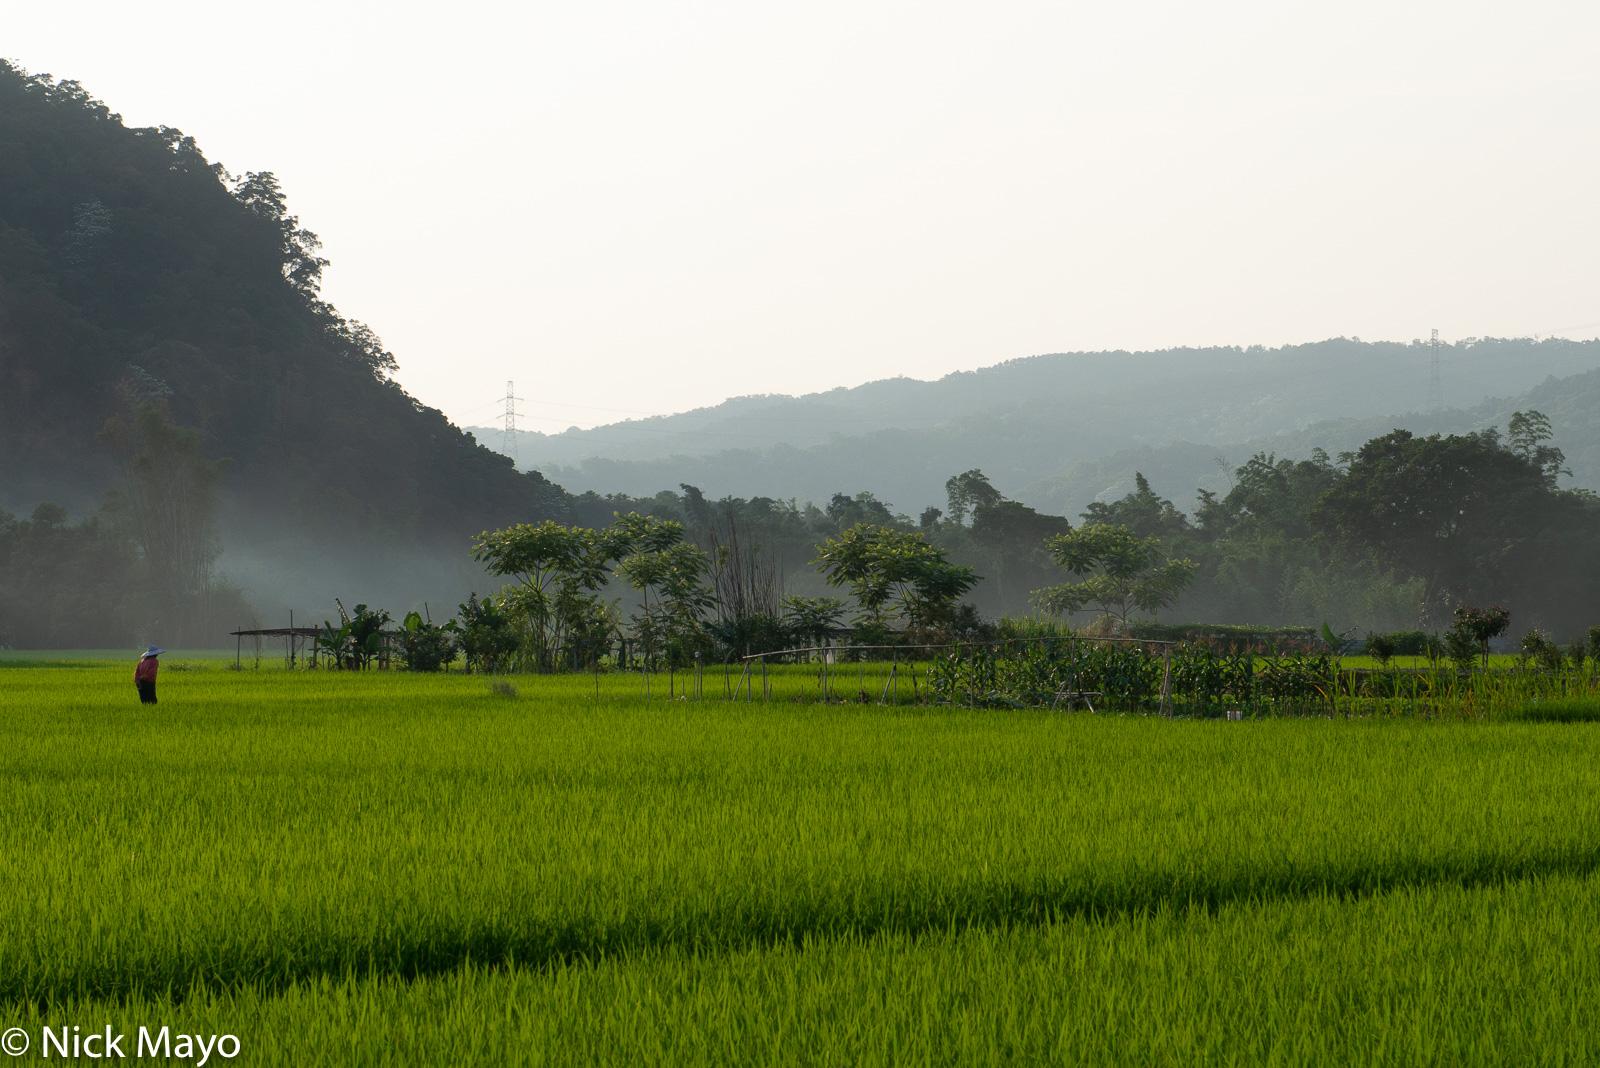 A farmer walking through his paddy fields near Guanxi at dusk.